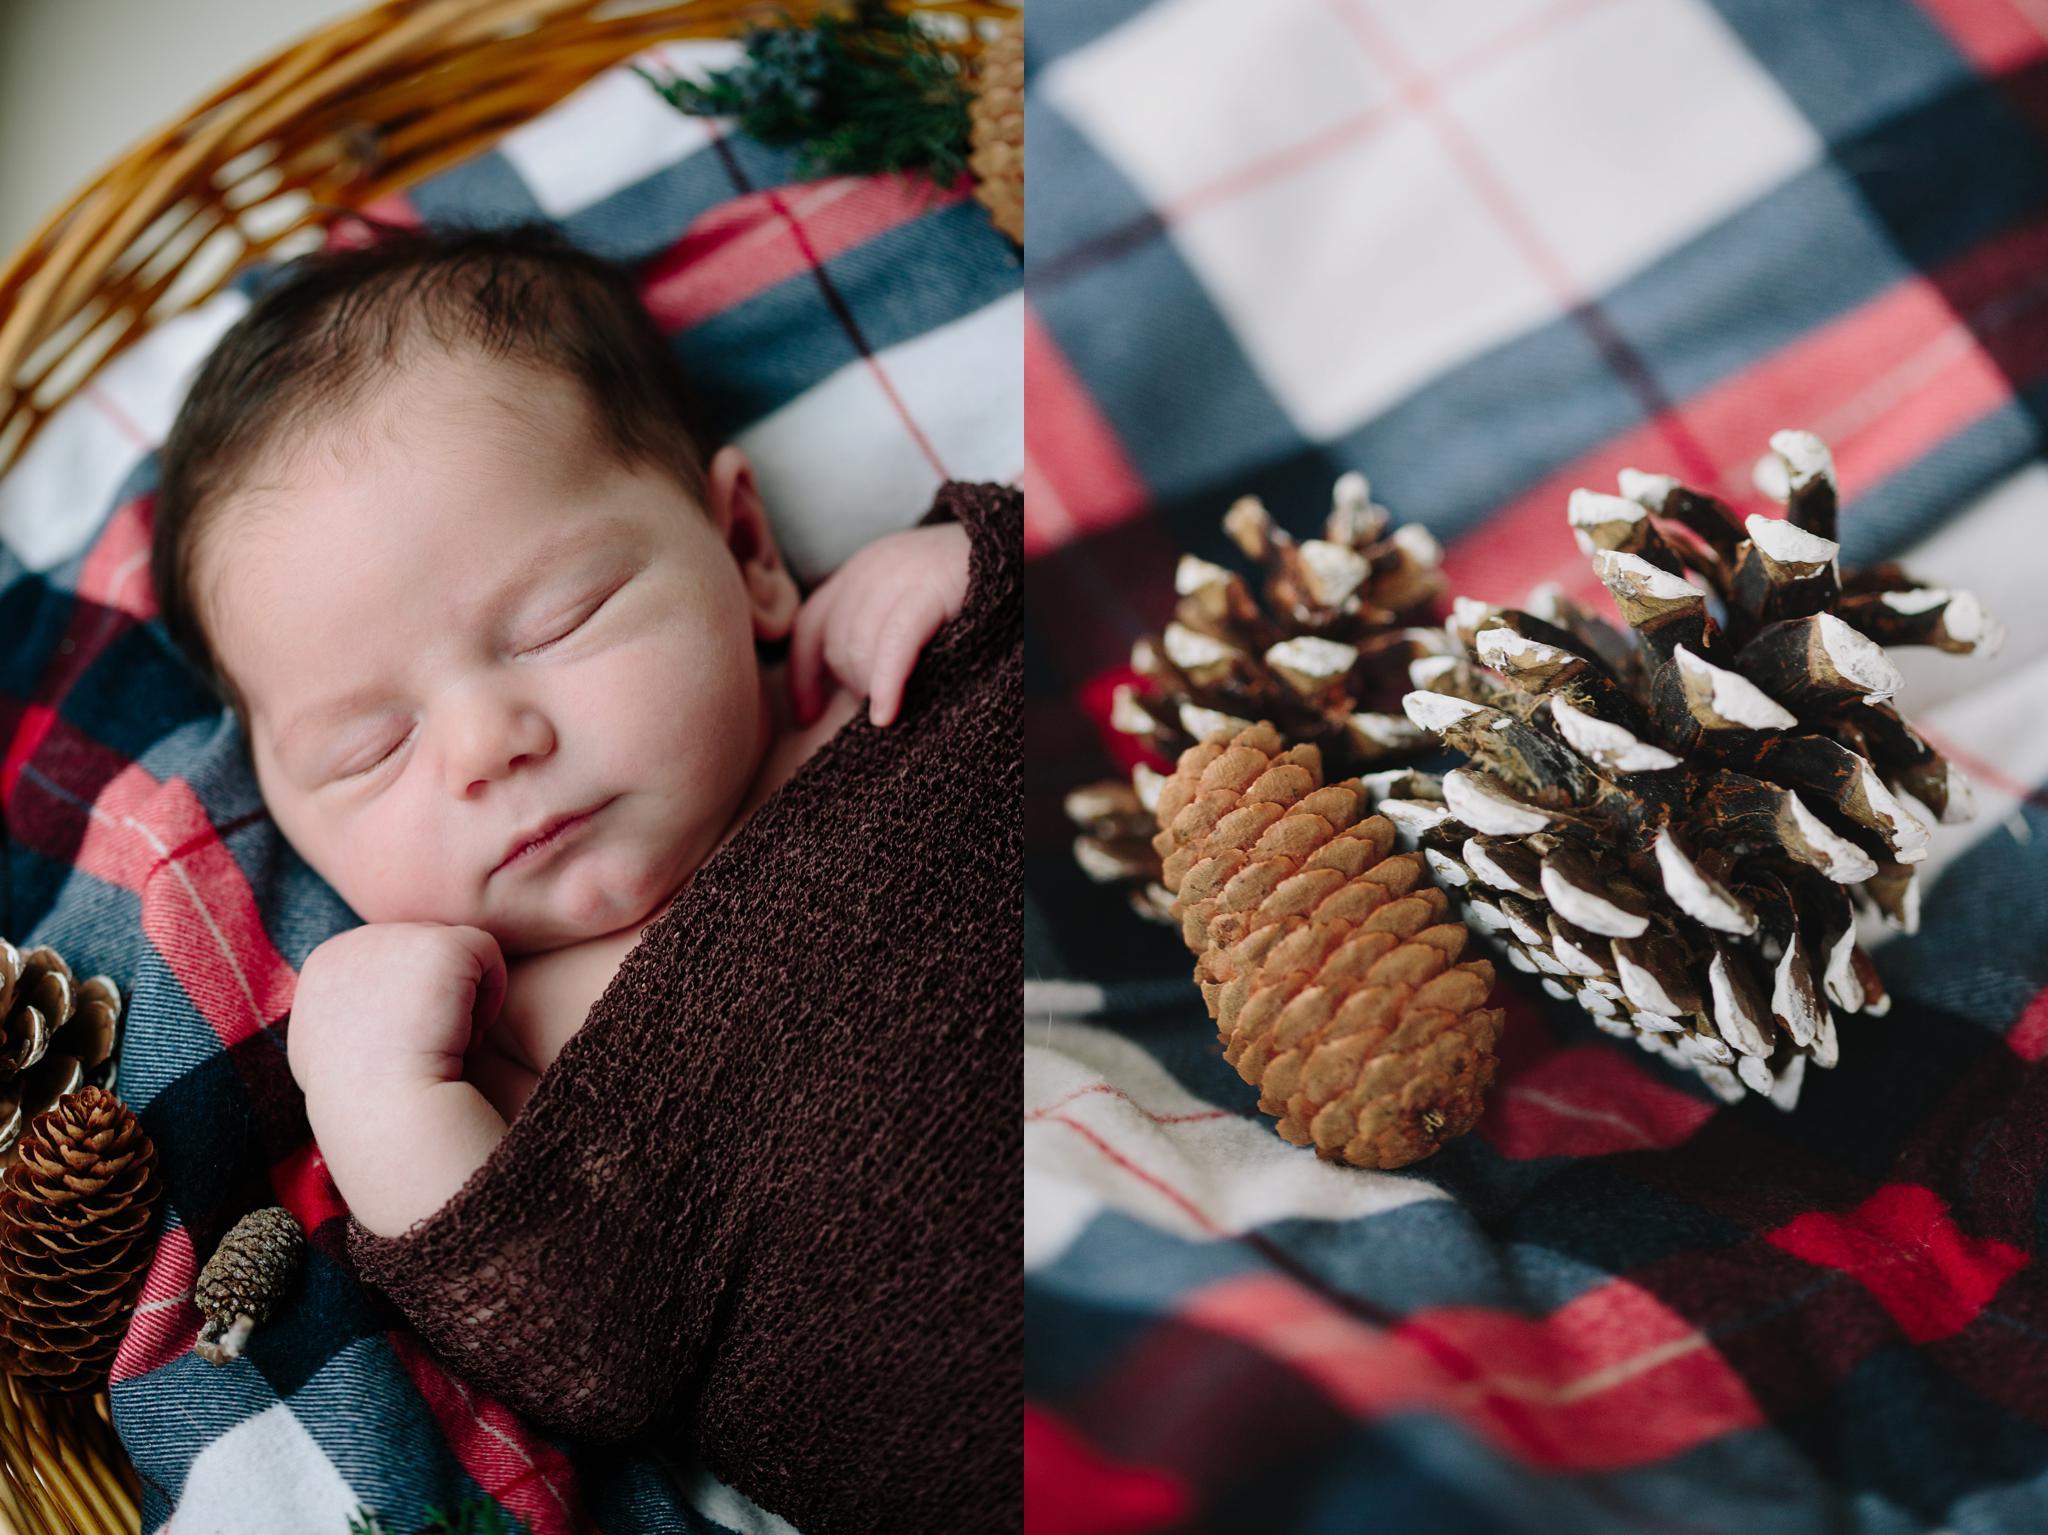 tunkhannock_newborn_photographer_4412.jpg